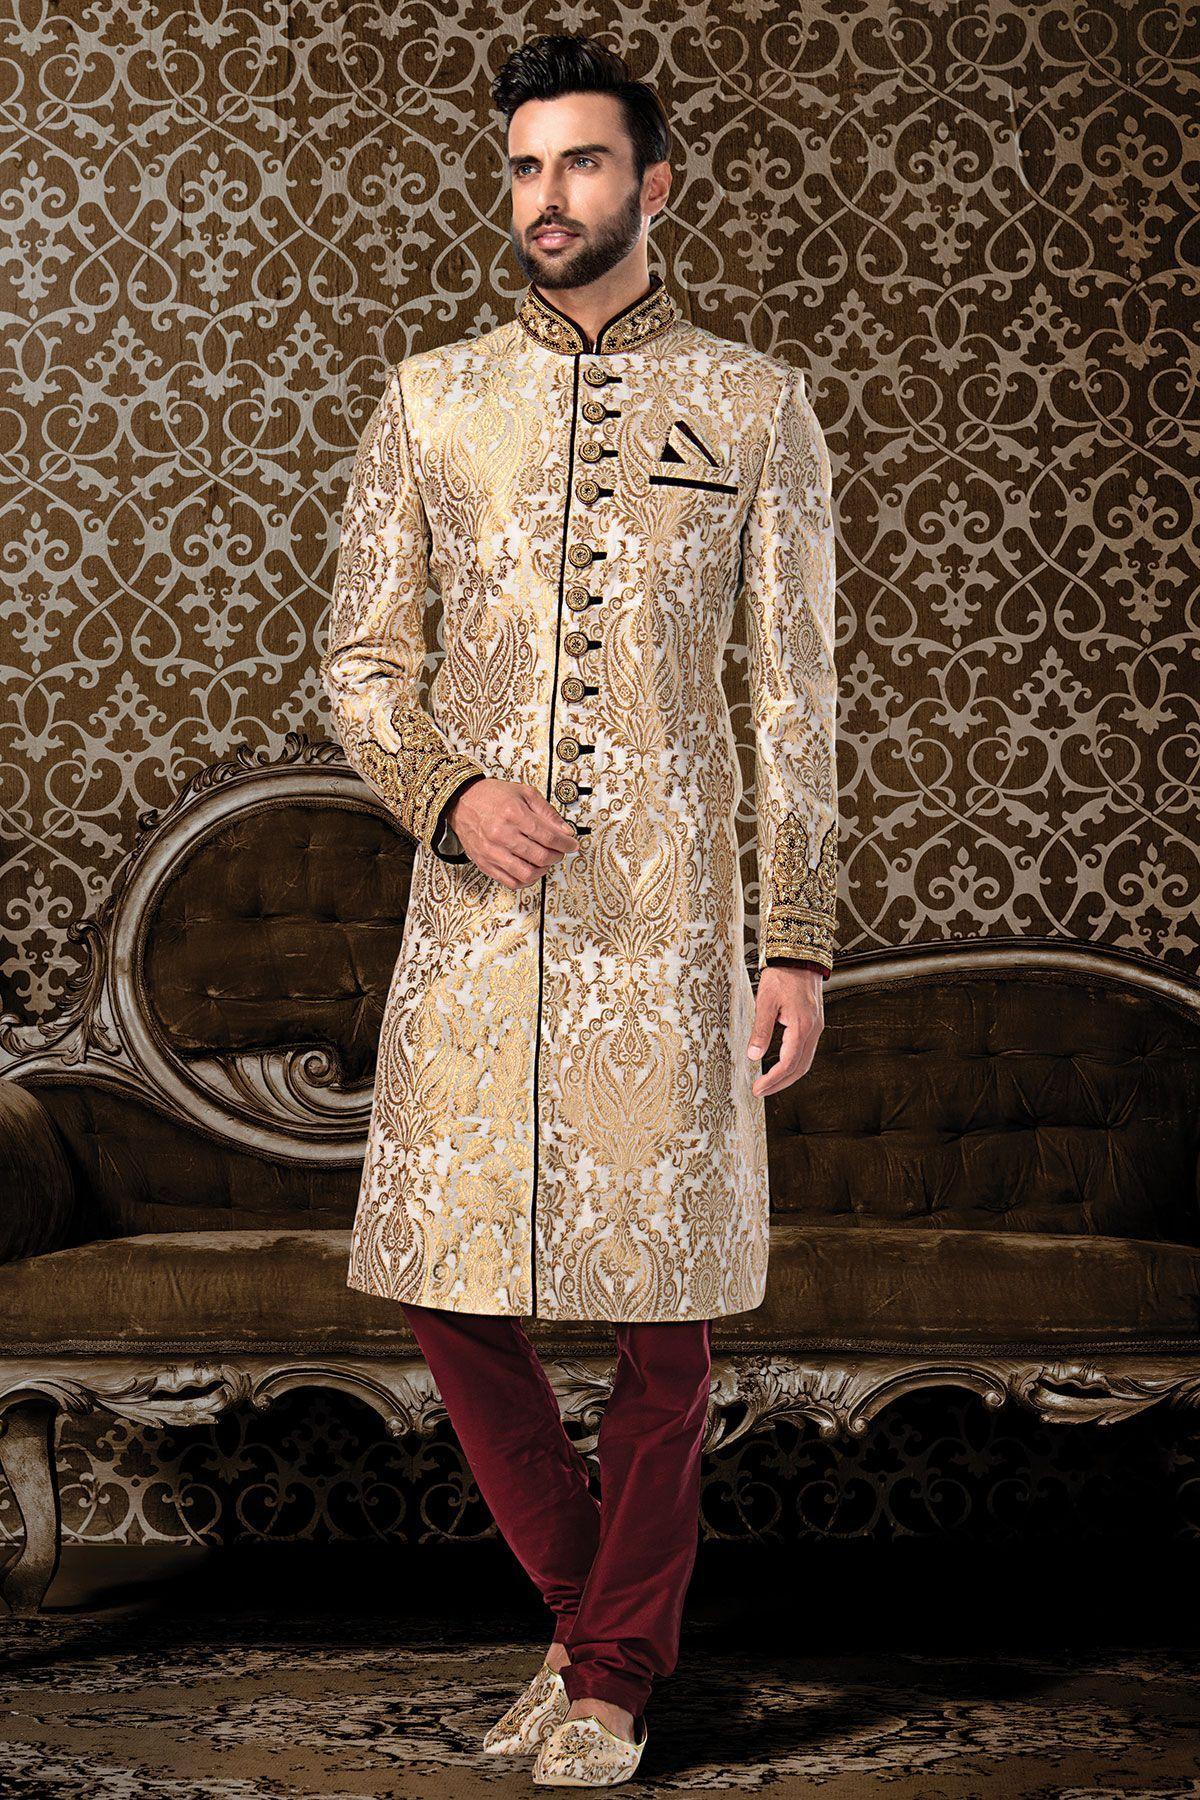 Men/'s Elegant Luxury Ethnic Indian Grooms Wedding White Sherwani Churidaar Pajama